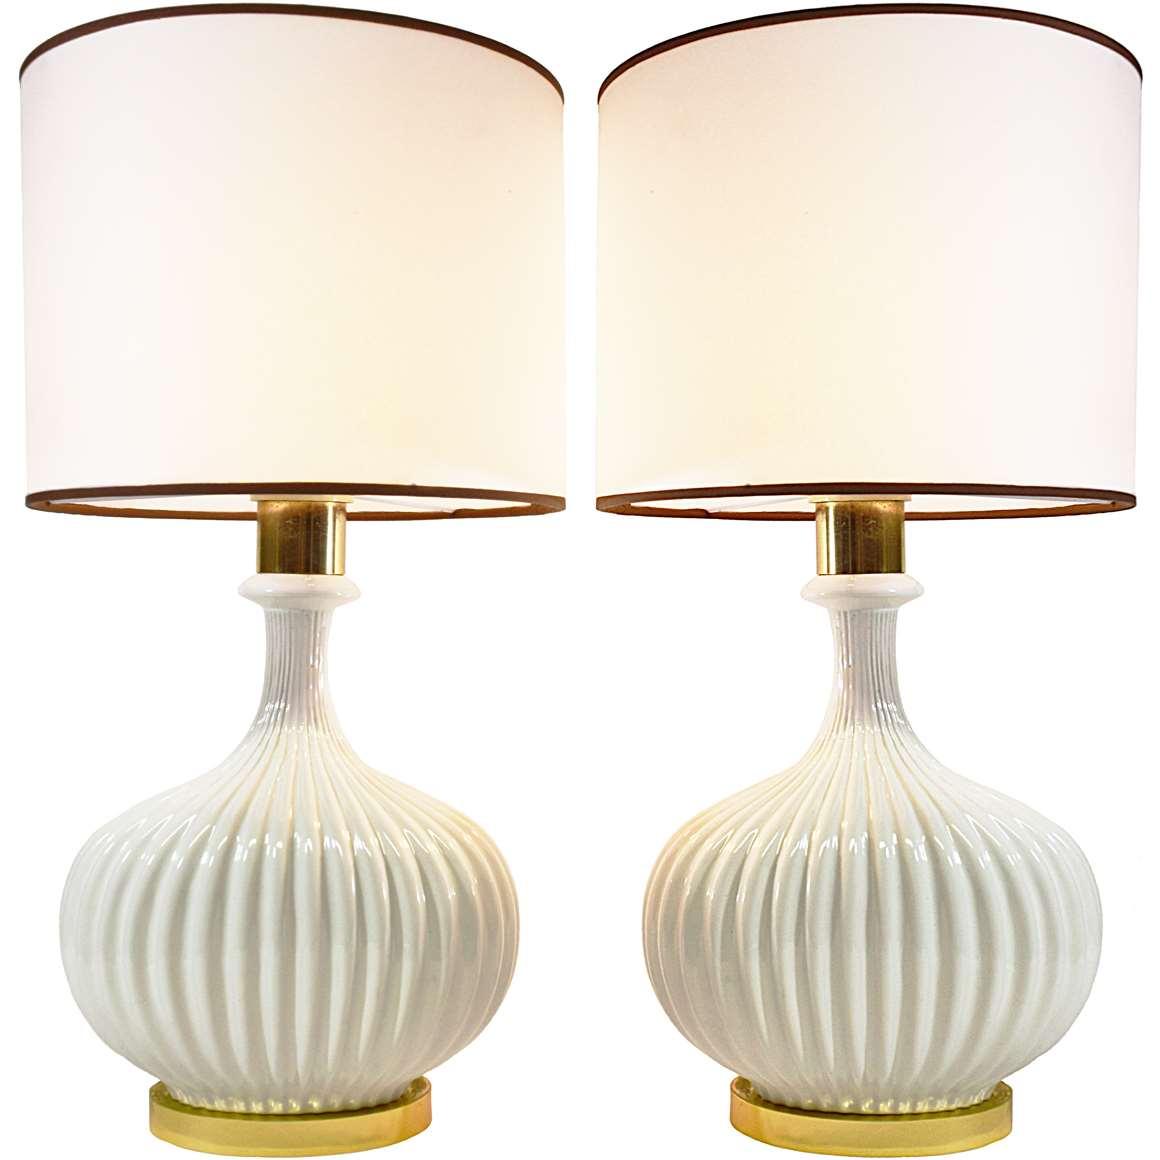 Ceramic & Brass Table Lamps